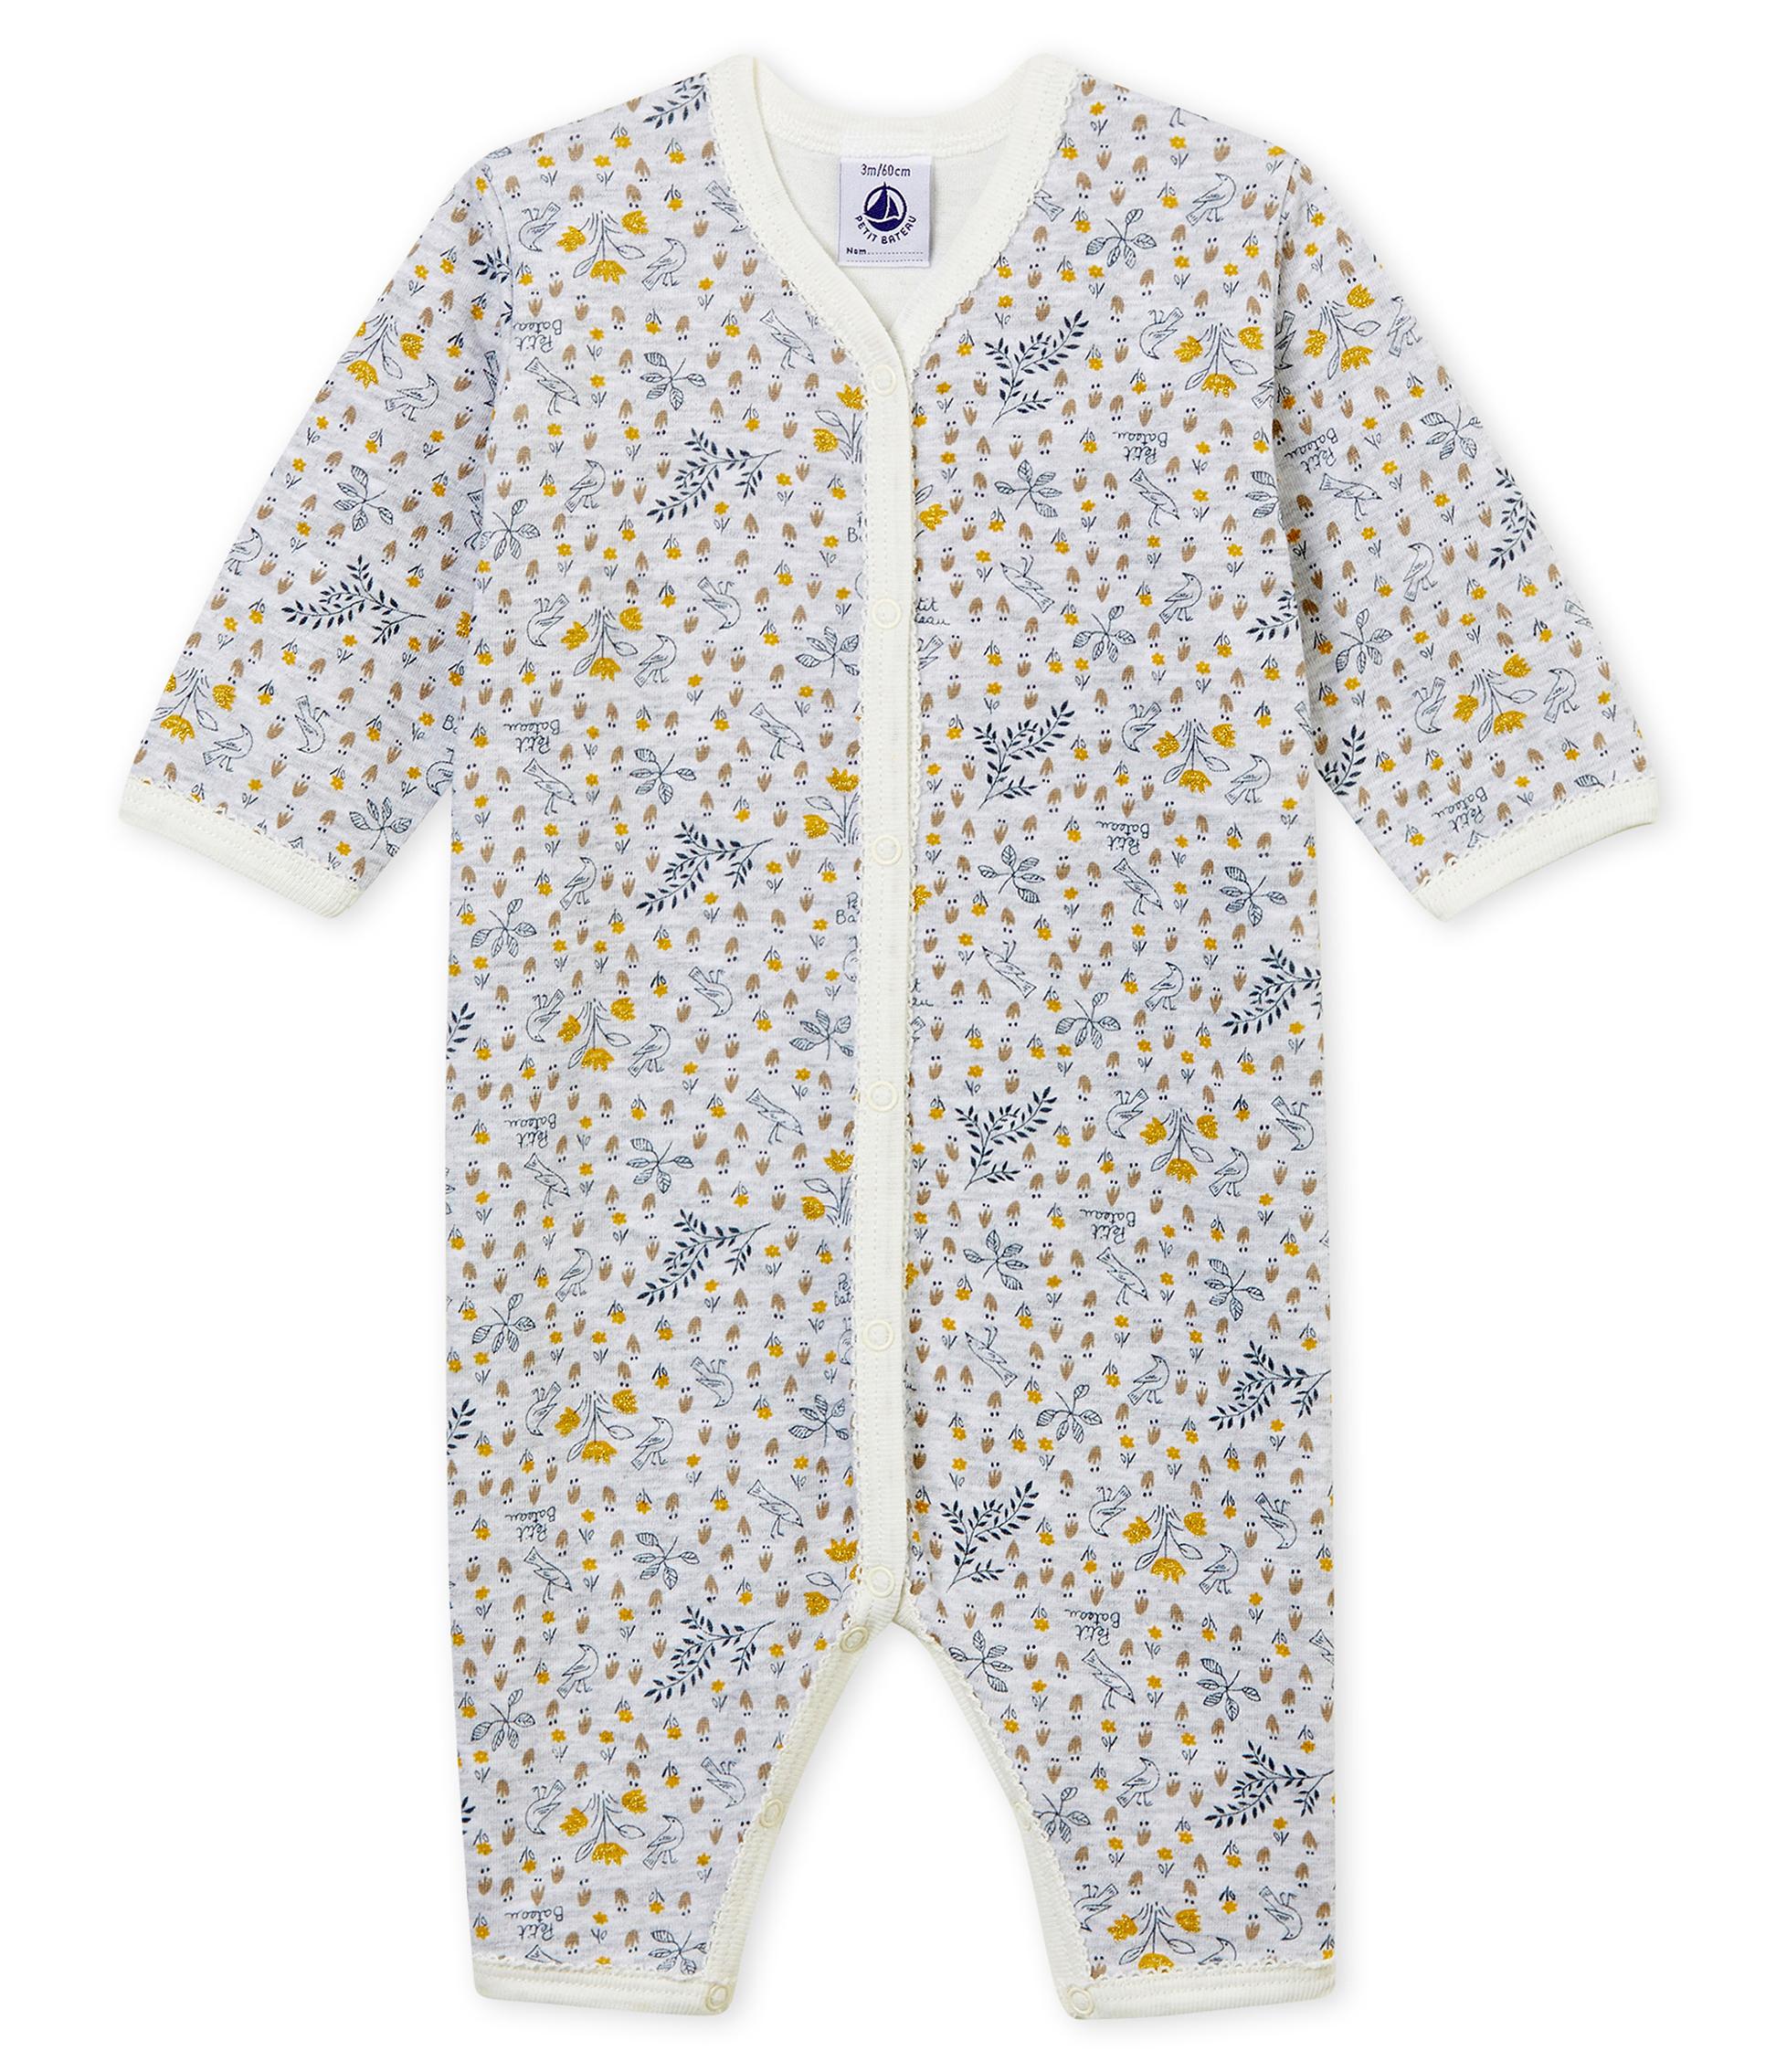 f9524cc33 Pijama de bebé sin pies en punto suave para niña | Petit Bateau